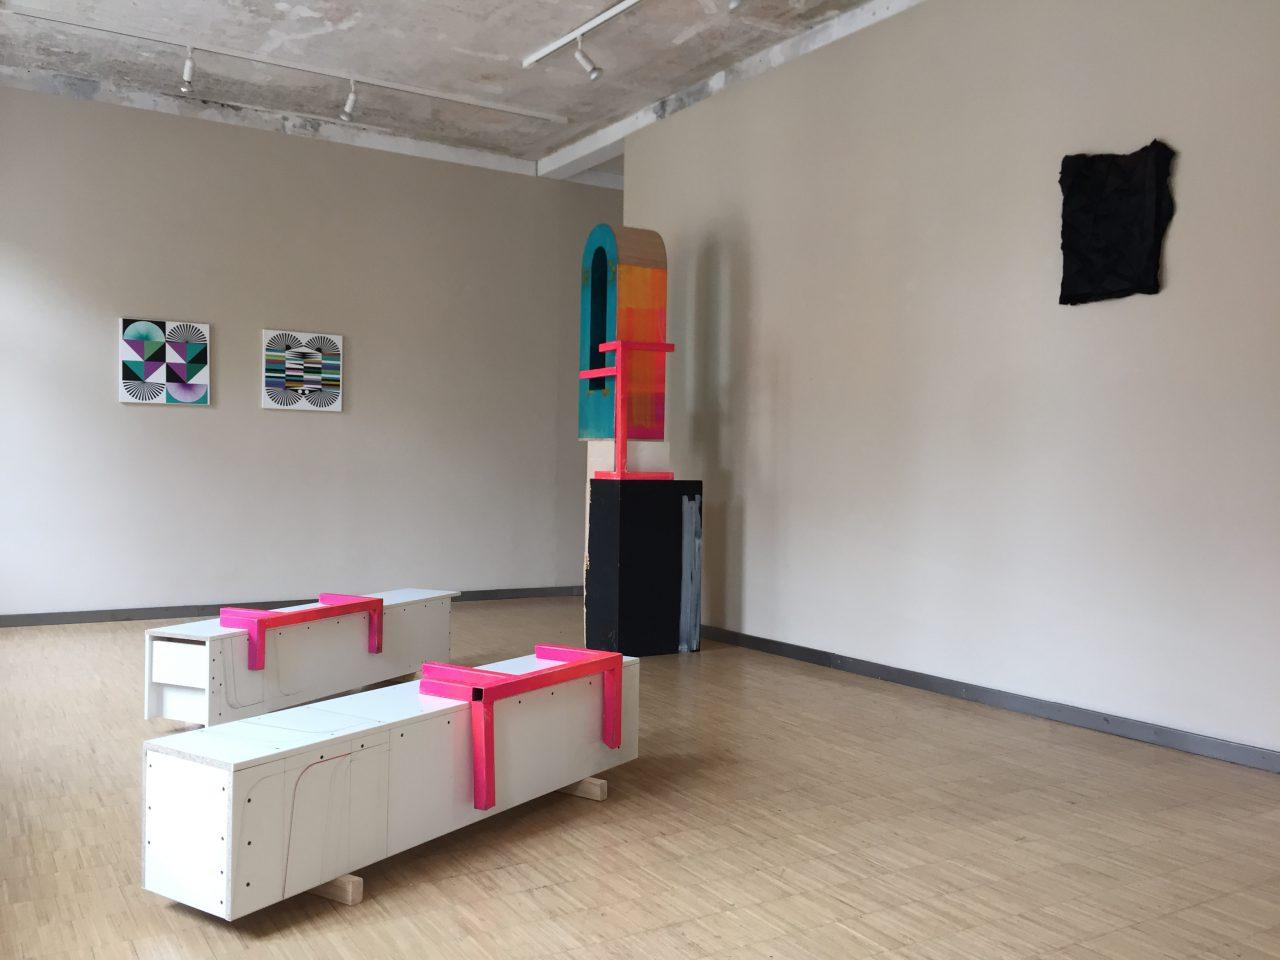 """Maximumlikelyhood"", Kunsthaus Erfurt, 2016, with DAG & Hannu Prinz(right)"